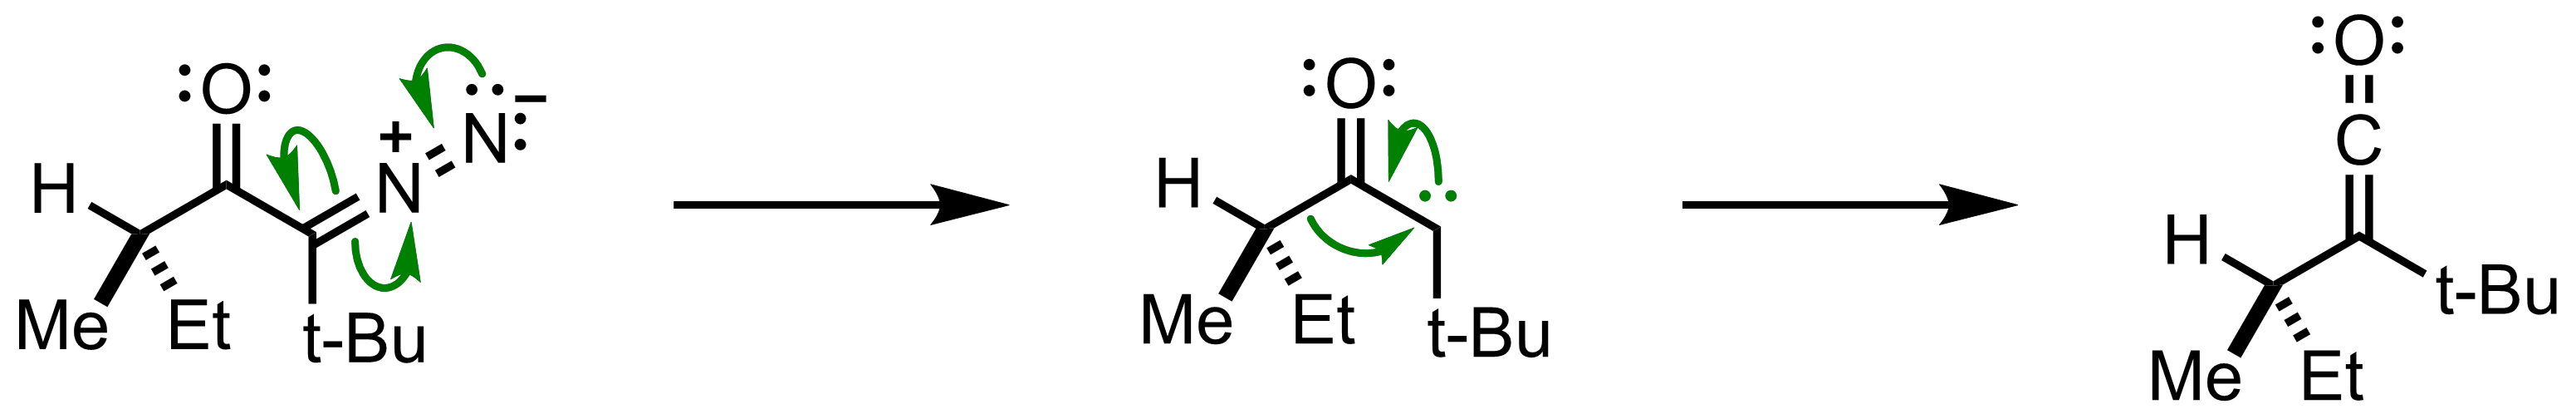 Mechanism of the Wolff Rearrangement